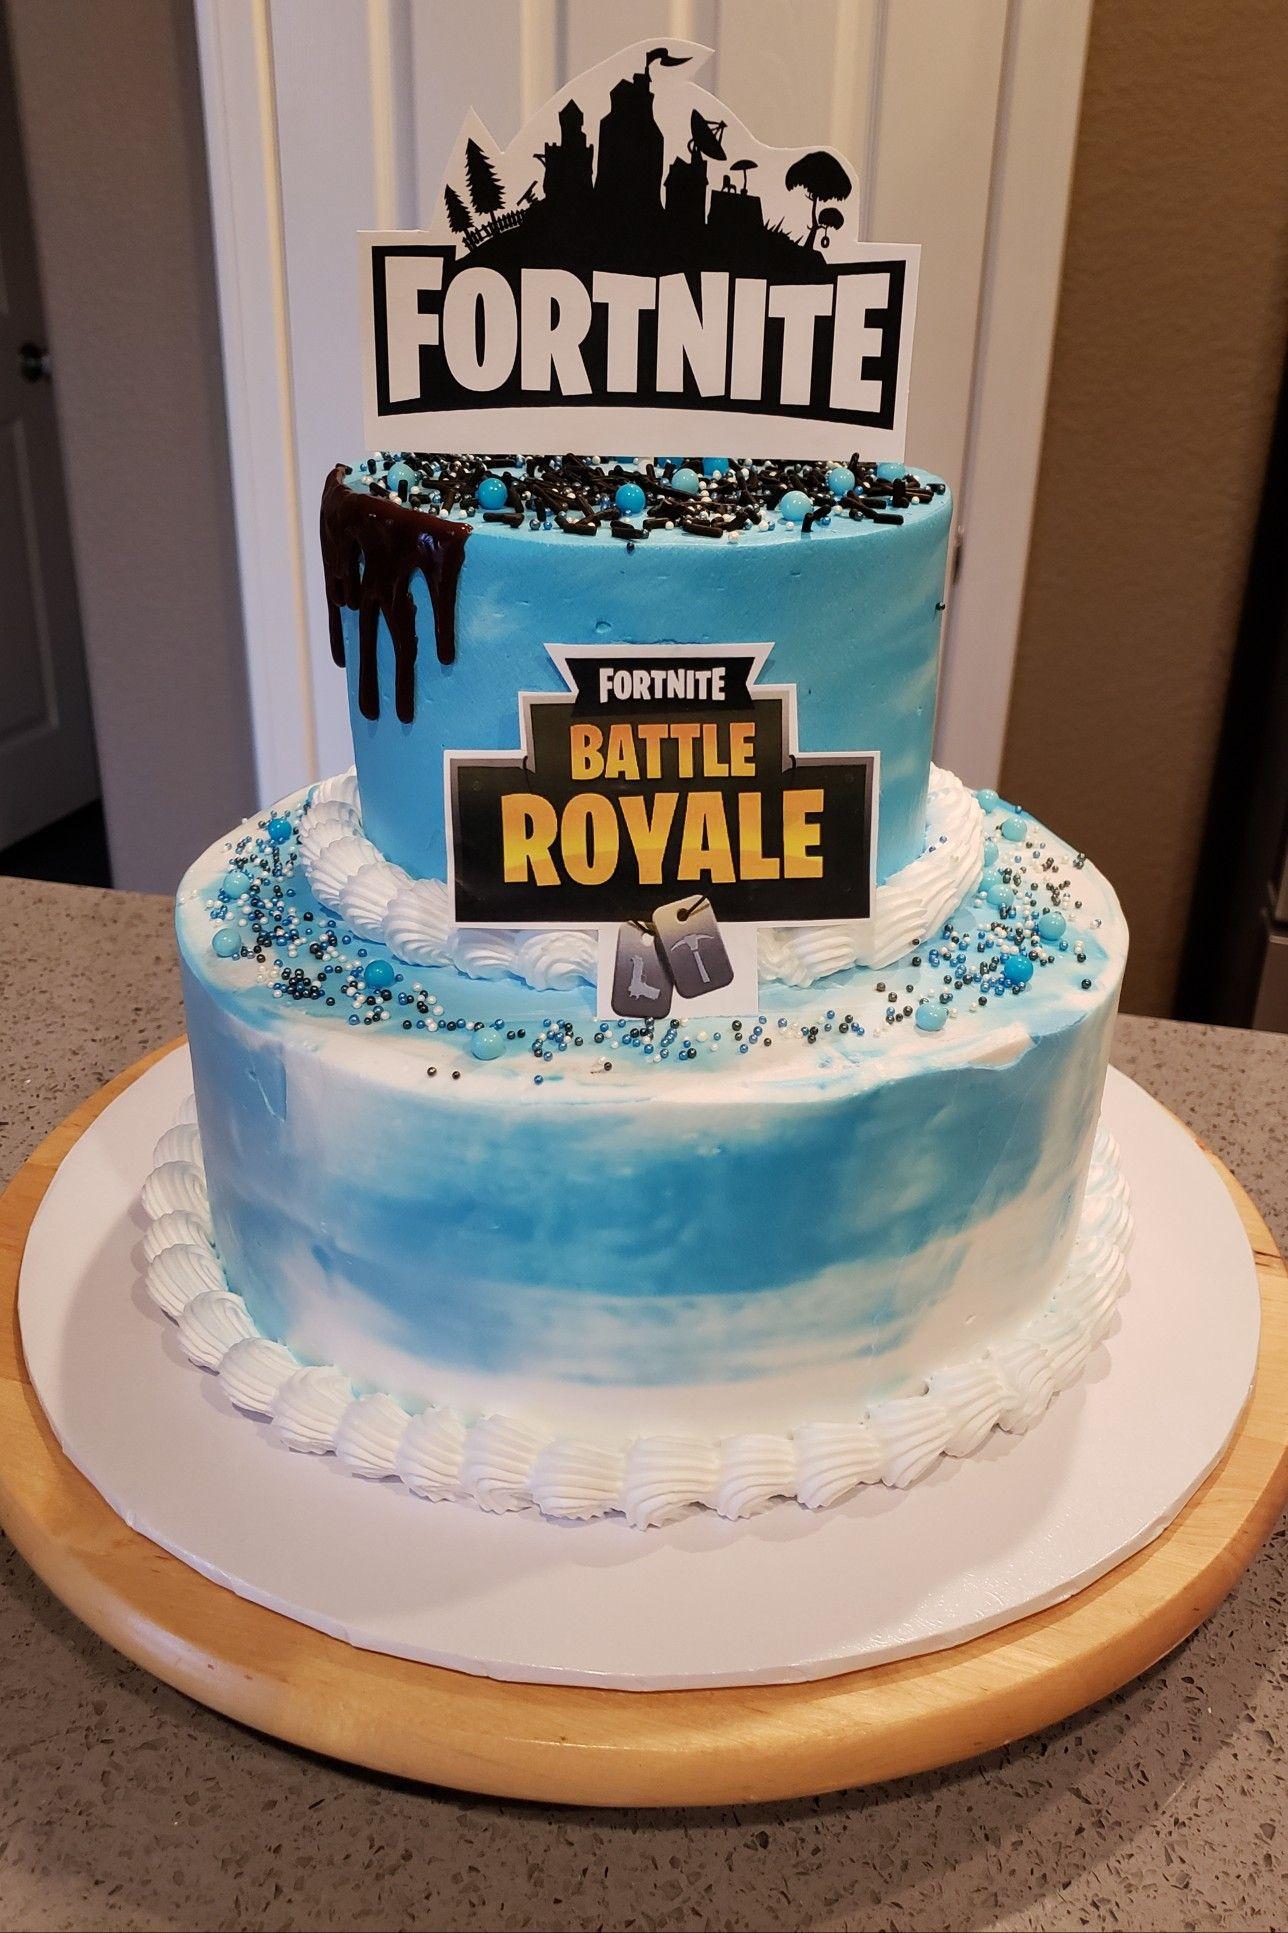 Season 7 Fortnite Cakes By Ositos Cakes In 2019 Bithday Cake